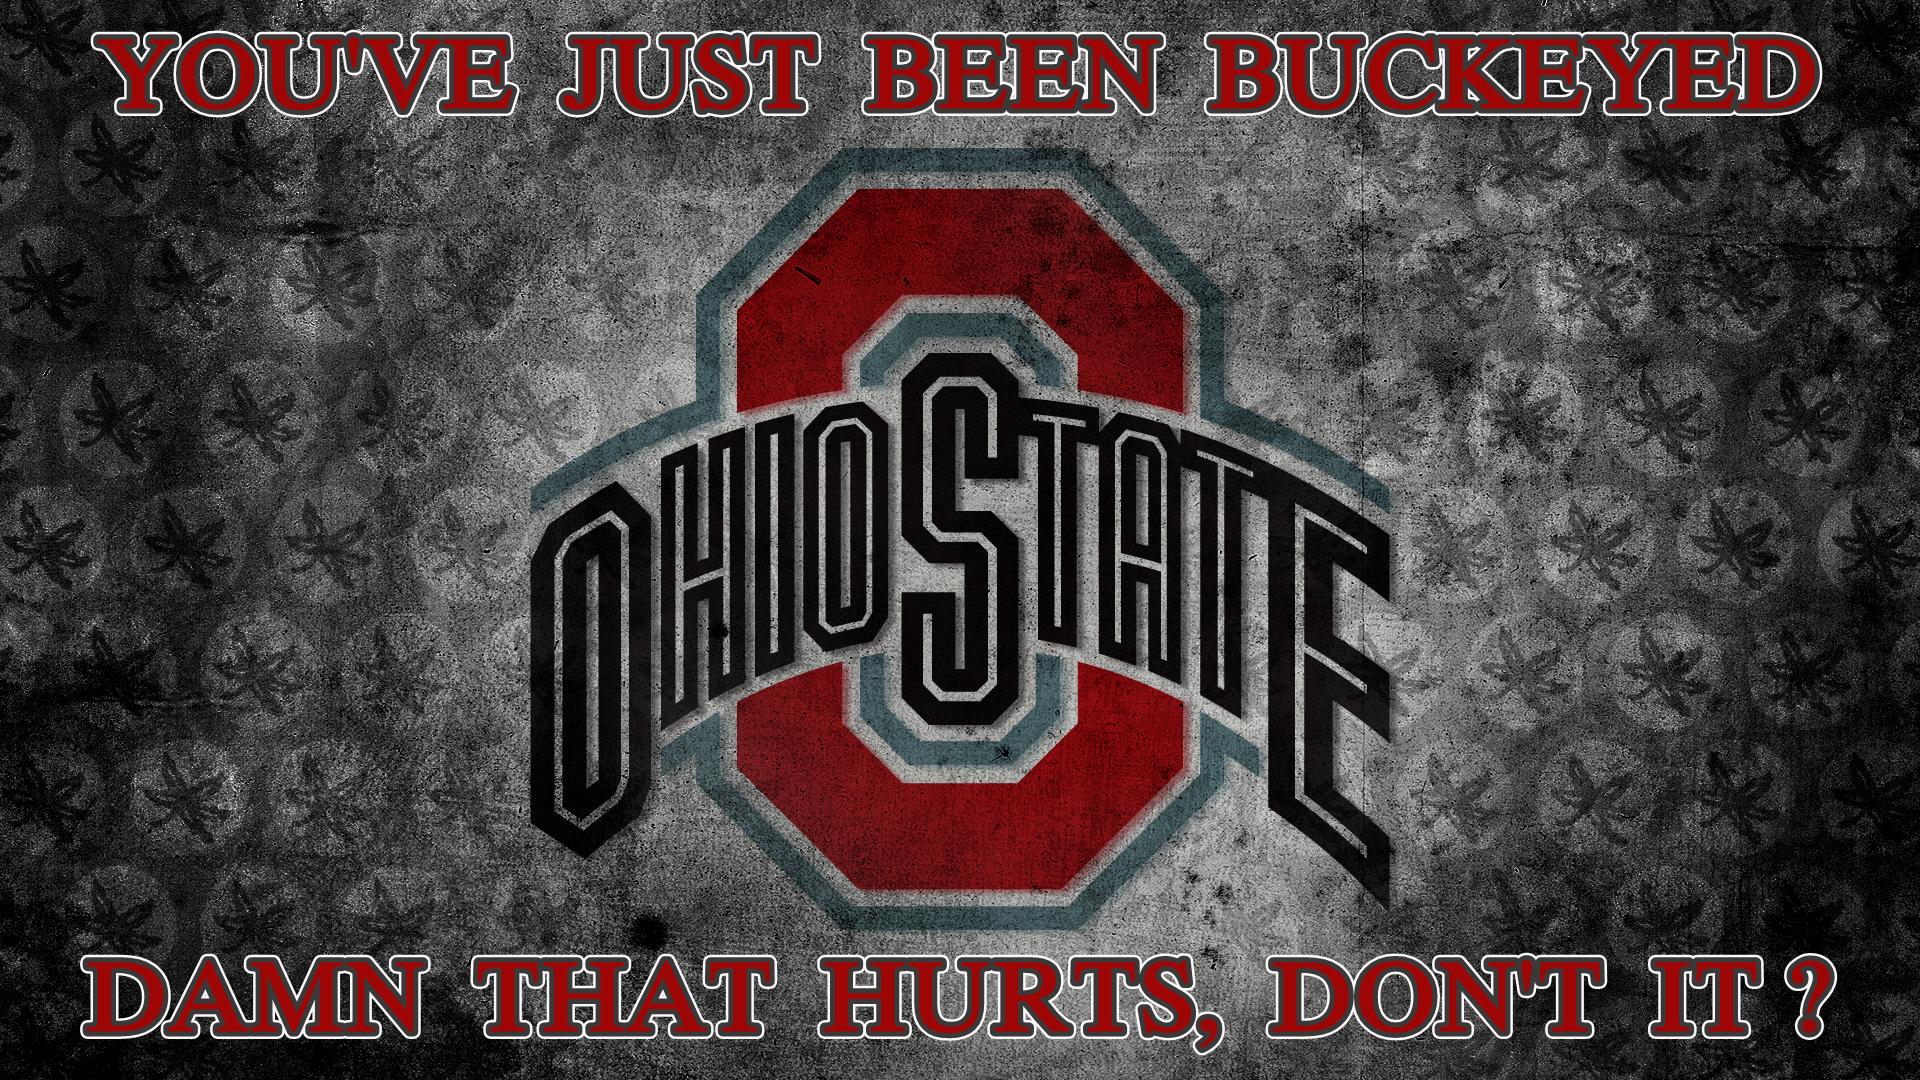 DAMN THAT HURTS - Ohio State University Basketball Wallpaper (26349786 ...